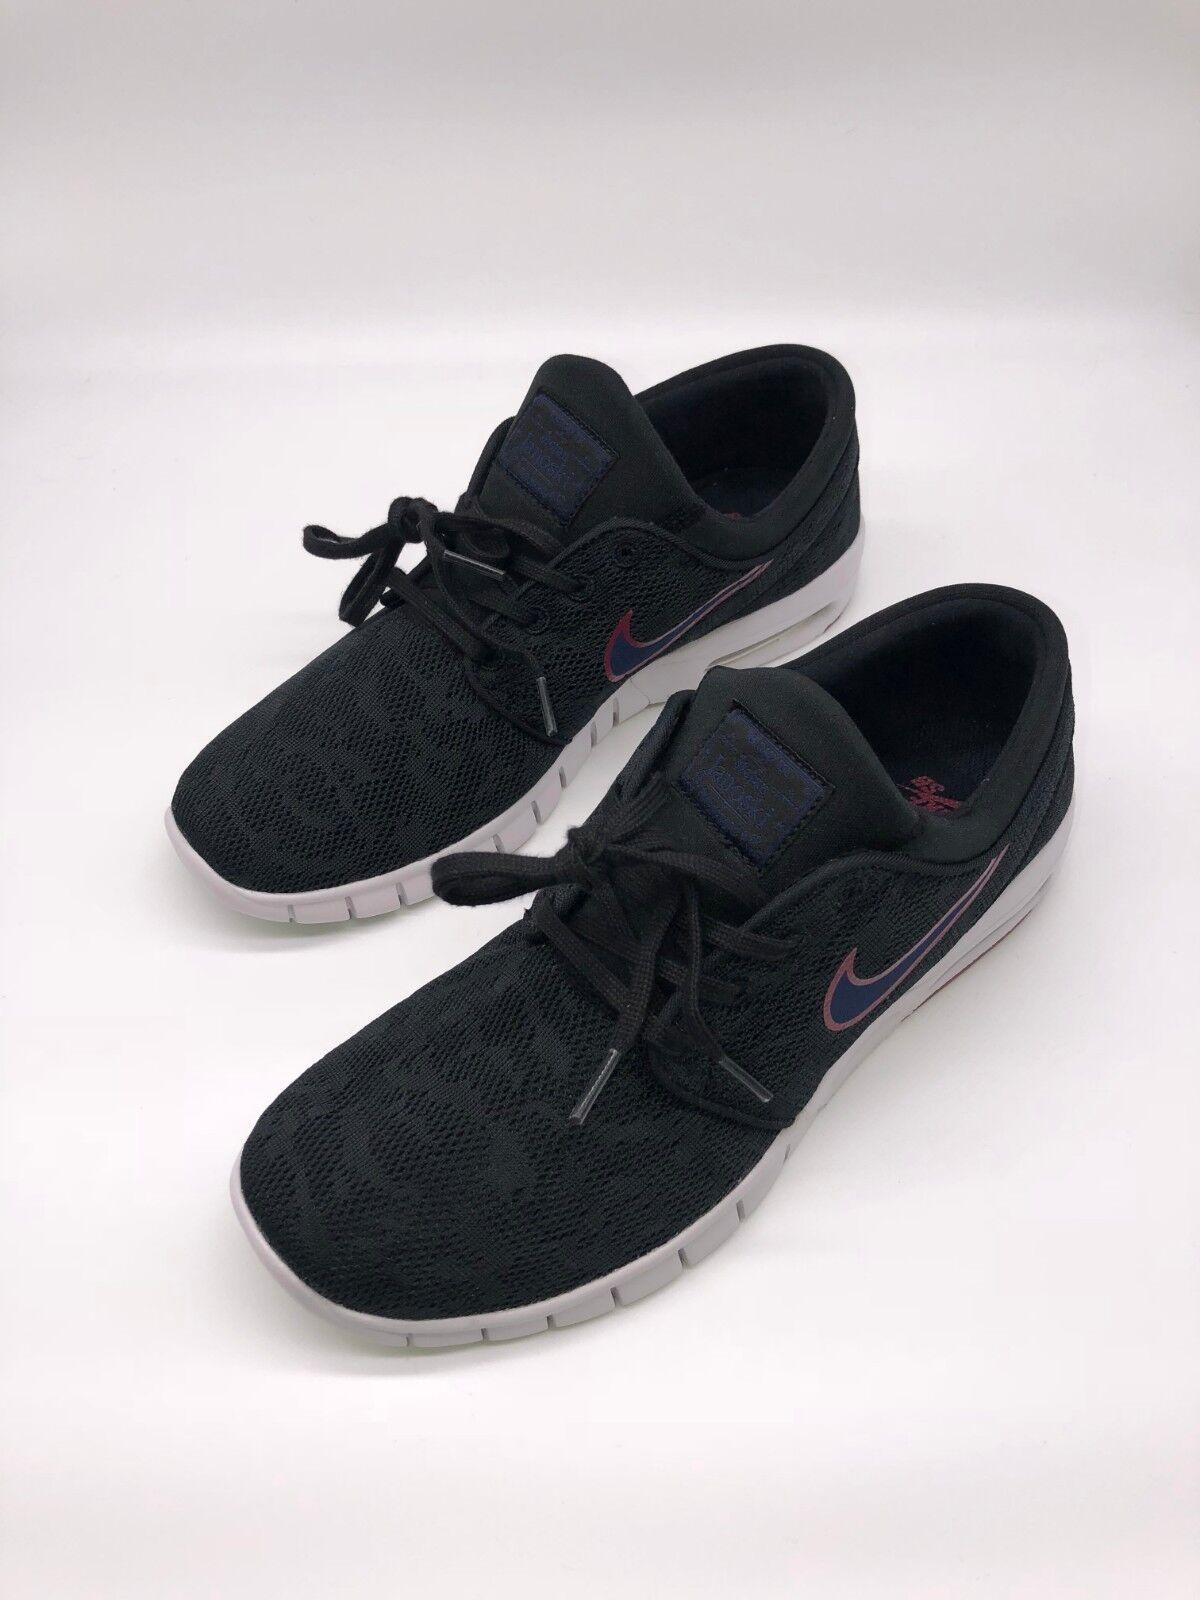 Nike Stefan Janoski Max-UK Talla 6.5 - Negro blancoo Rojo (631303-027)